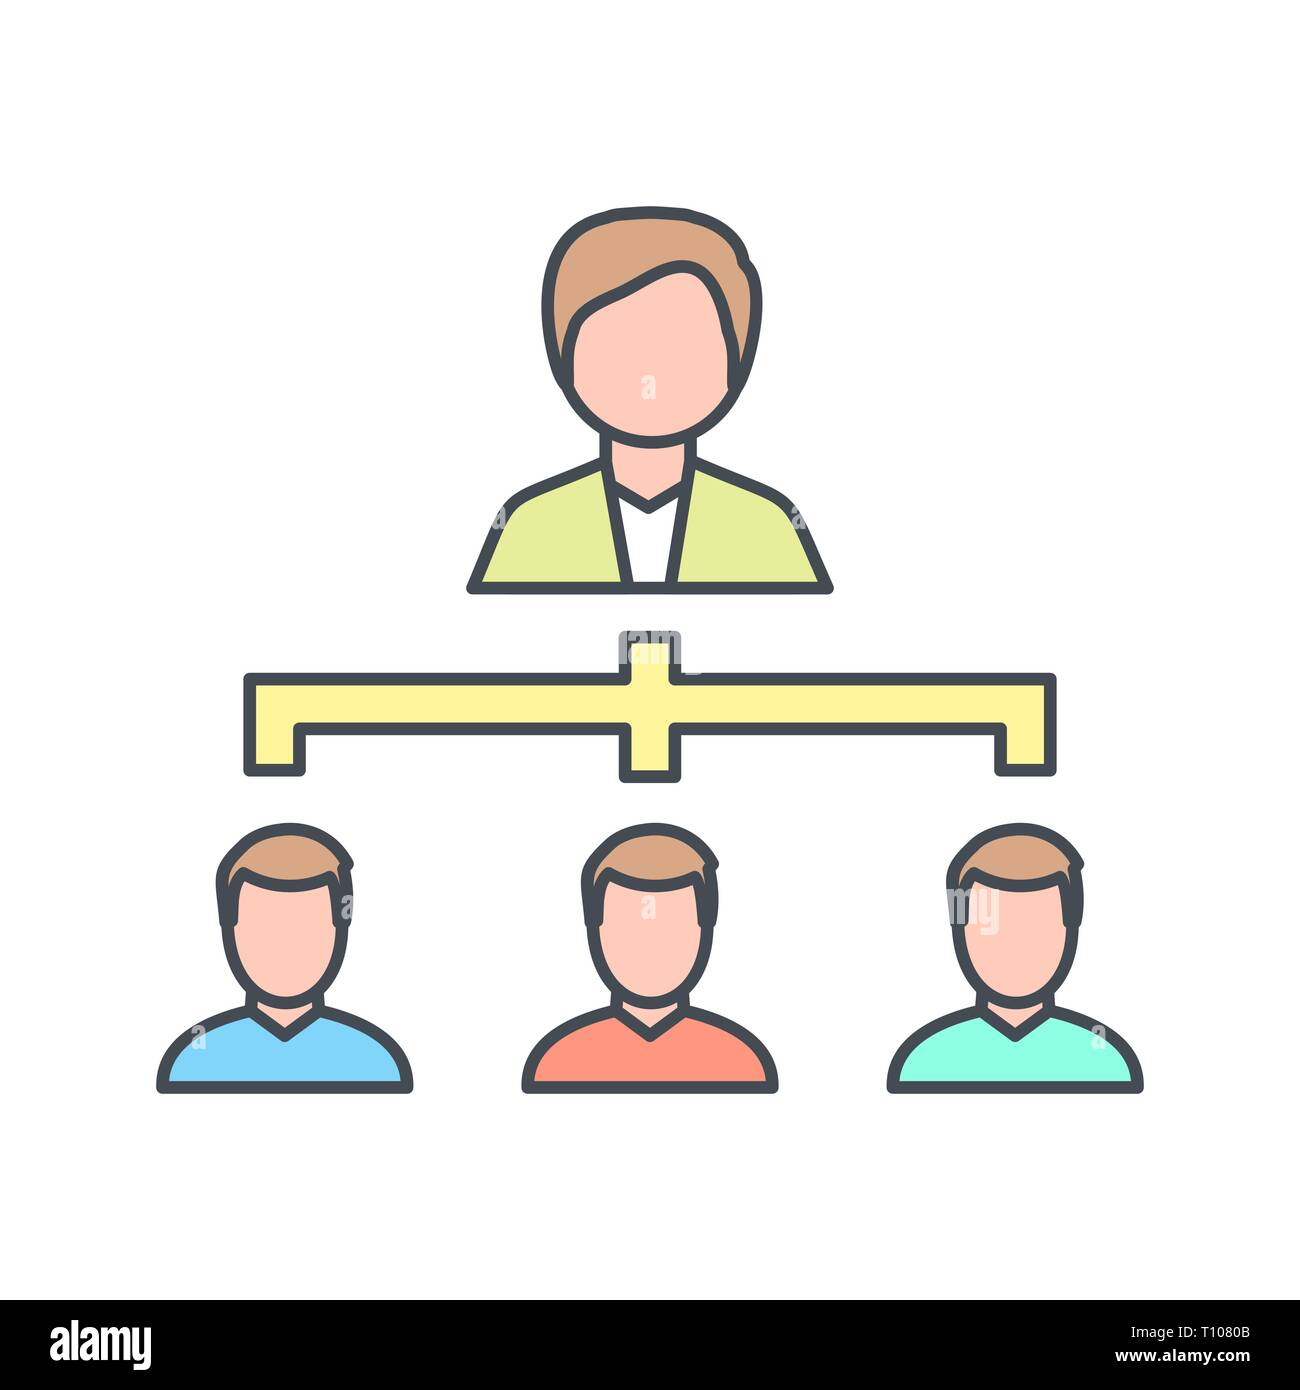 Illustration Organization Icon - Stock Image